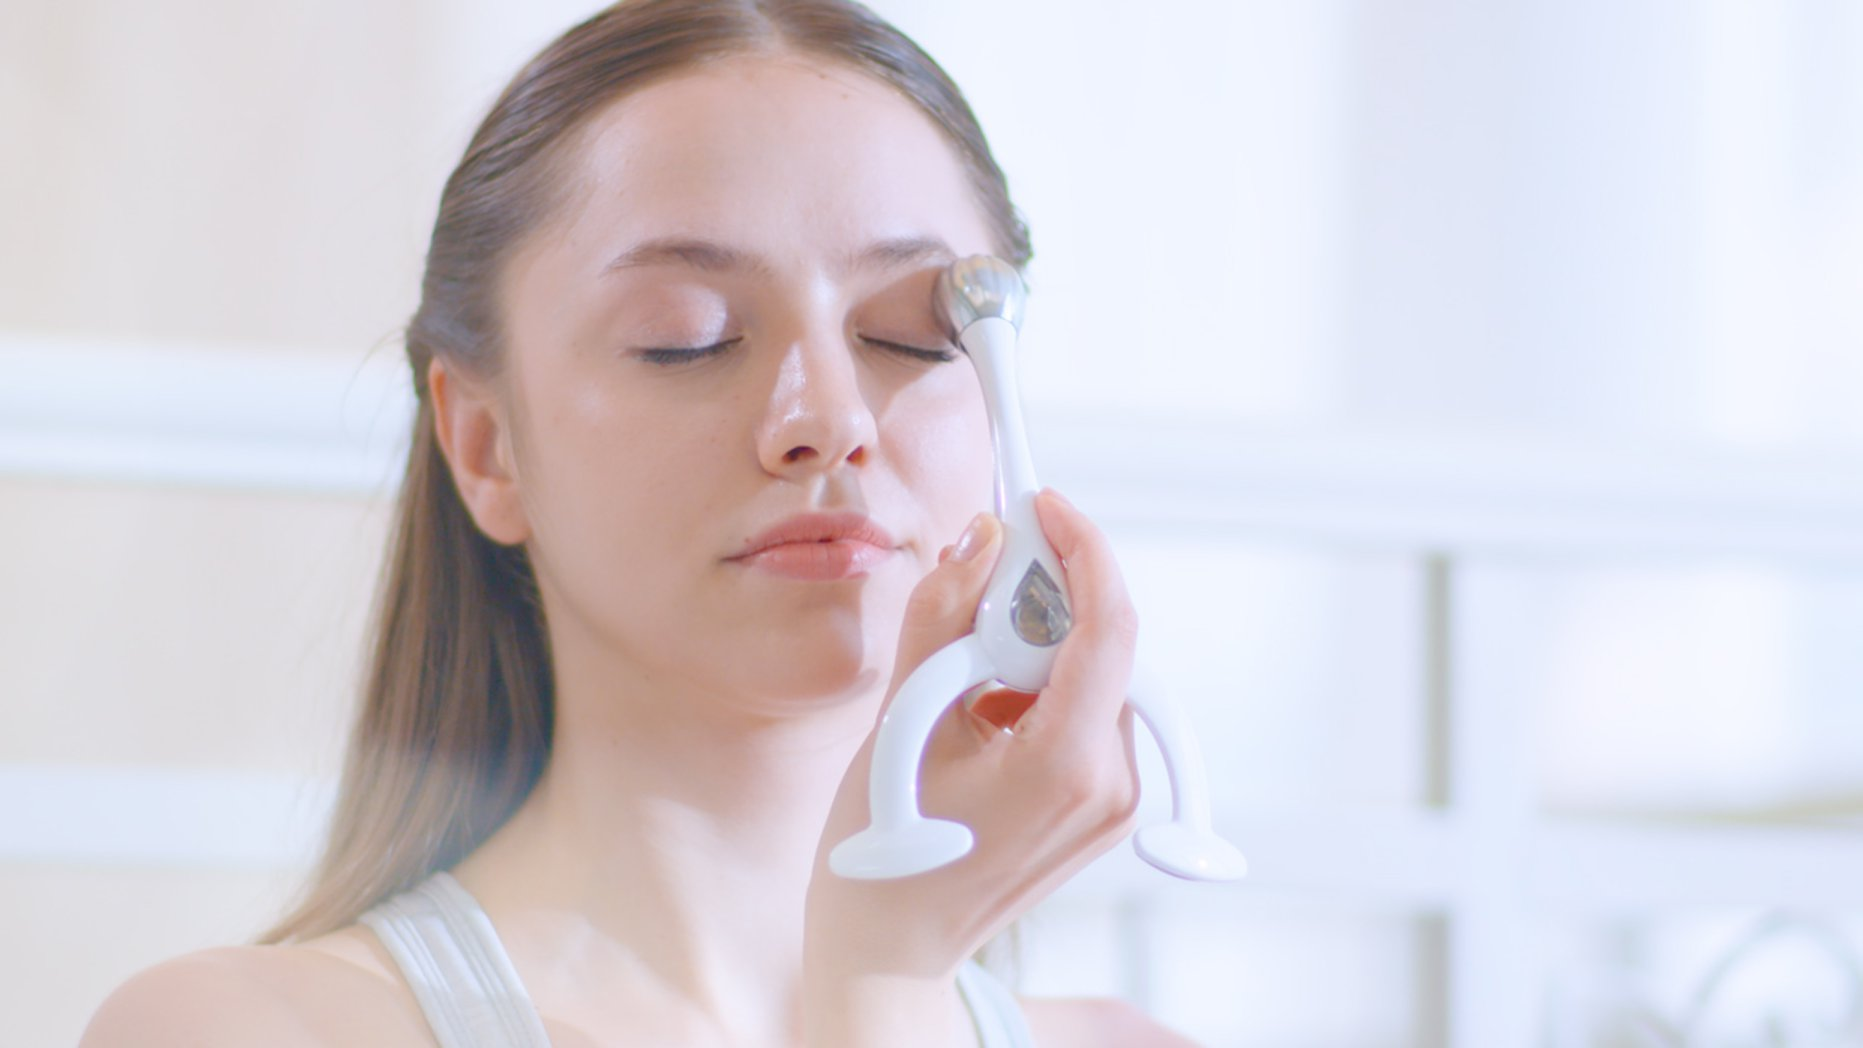 Face Massage Tool